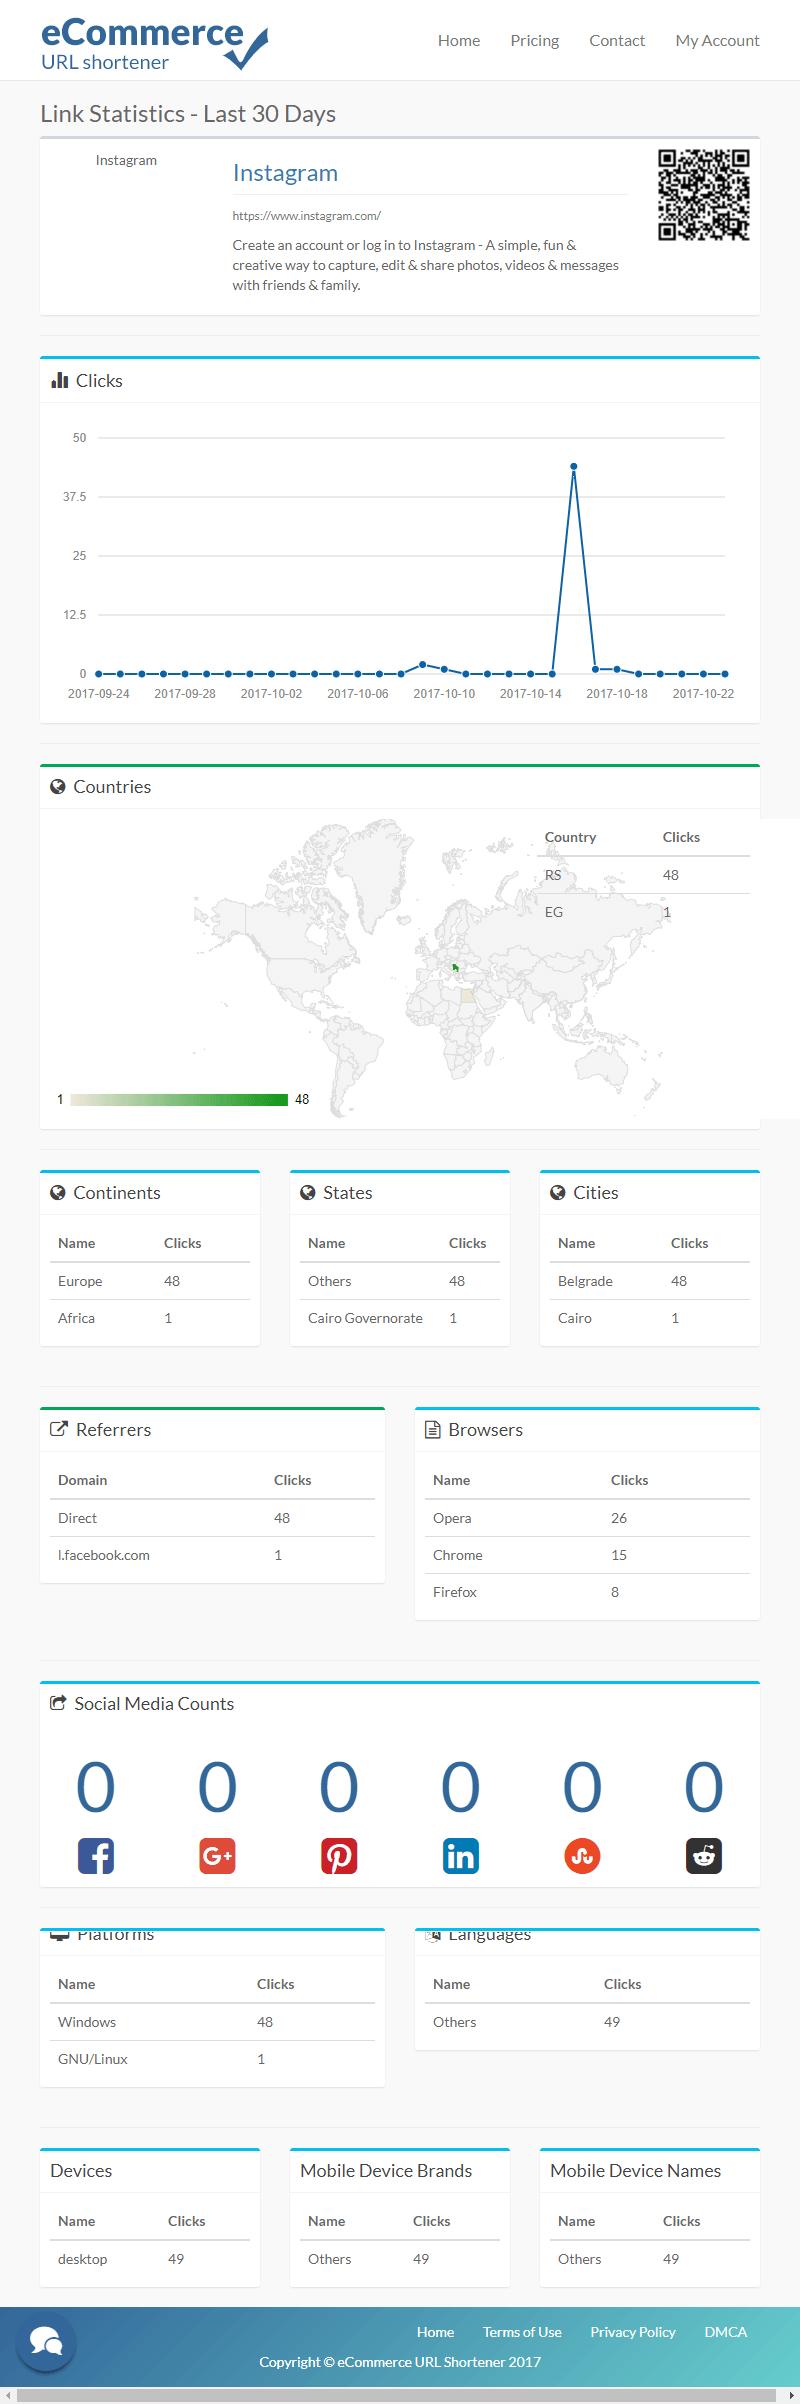 eCommerce URL Shortener - Statistics Page